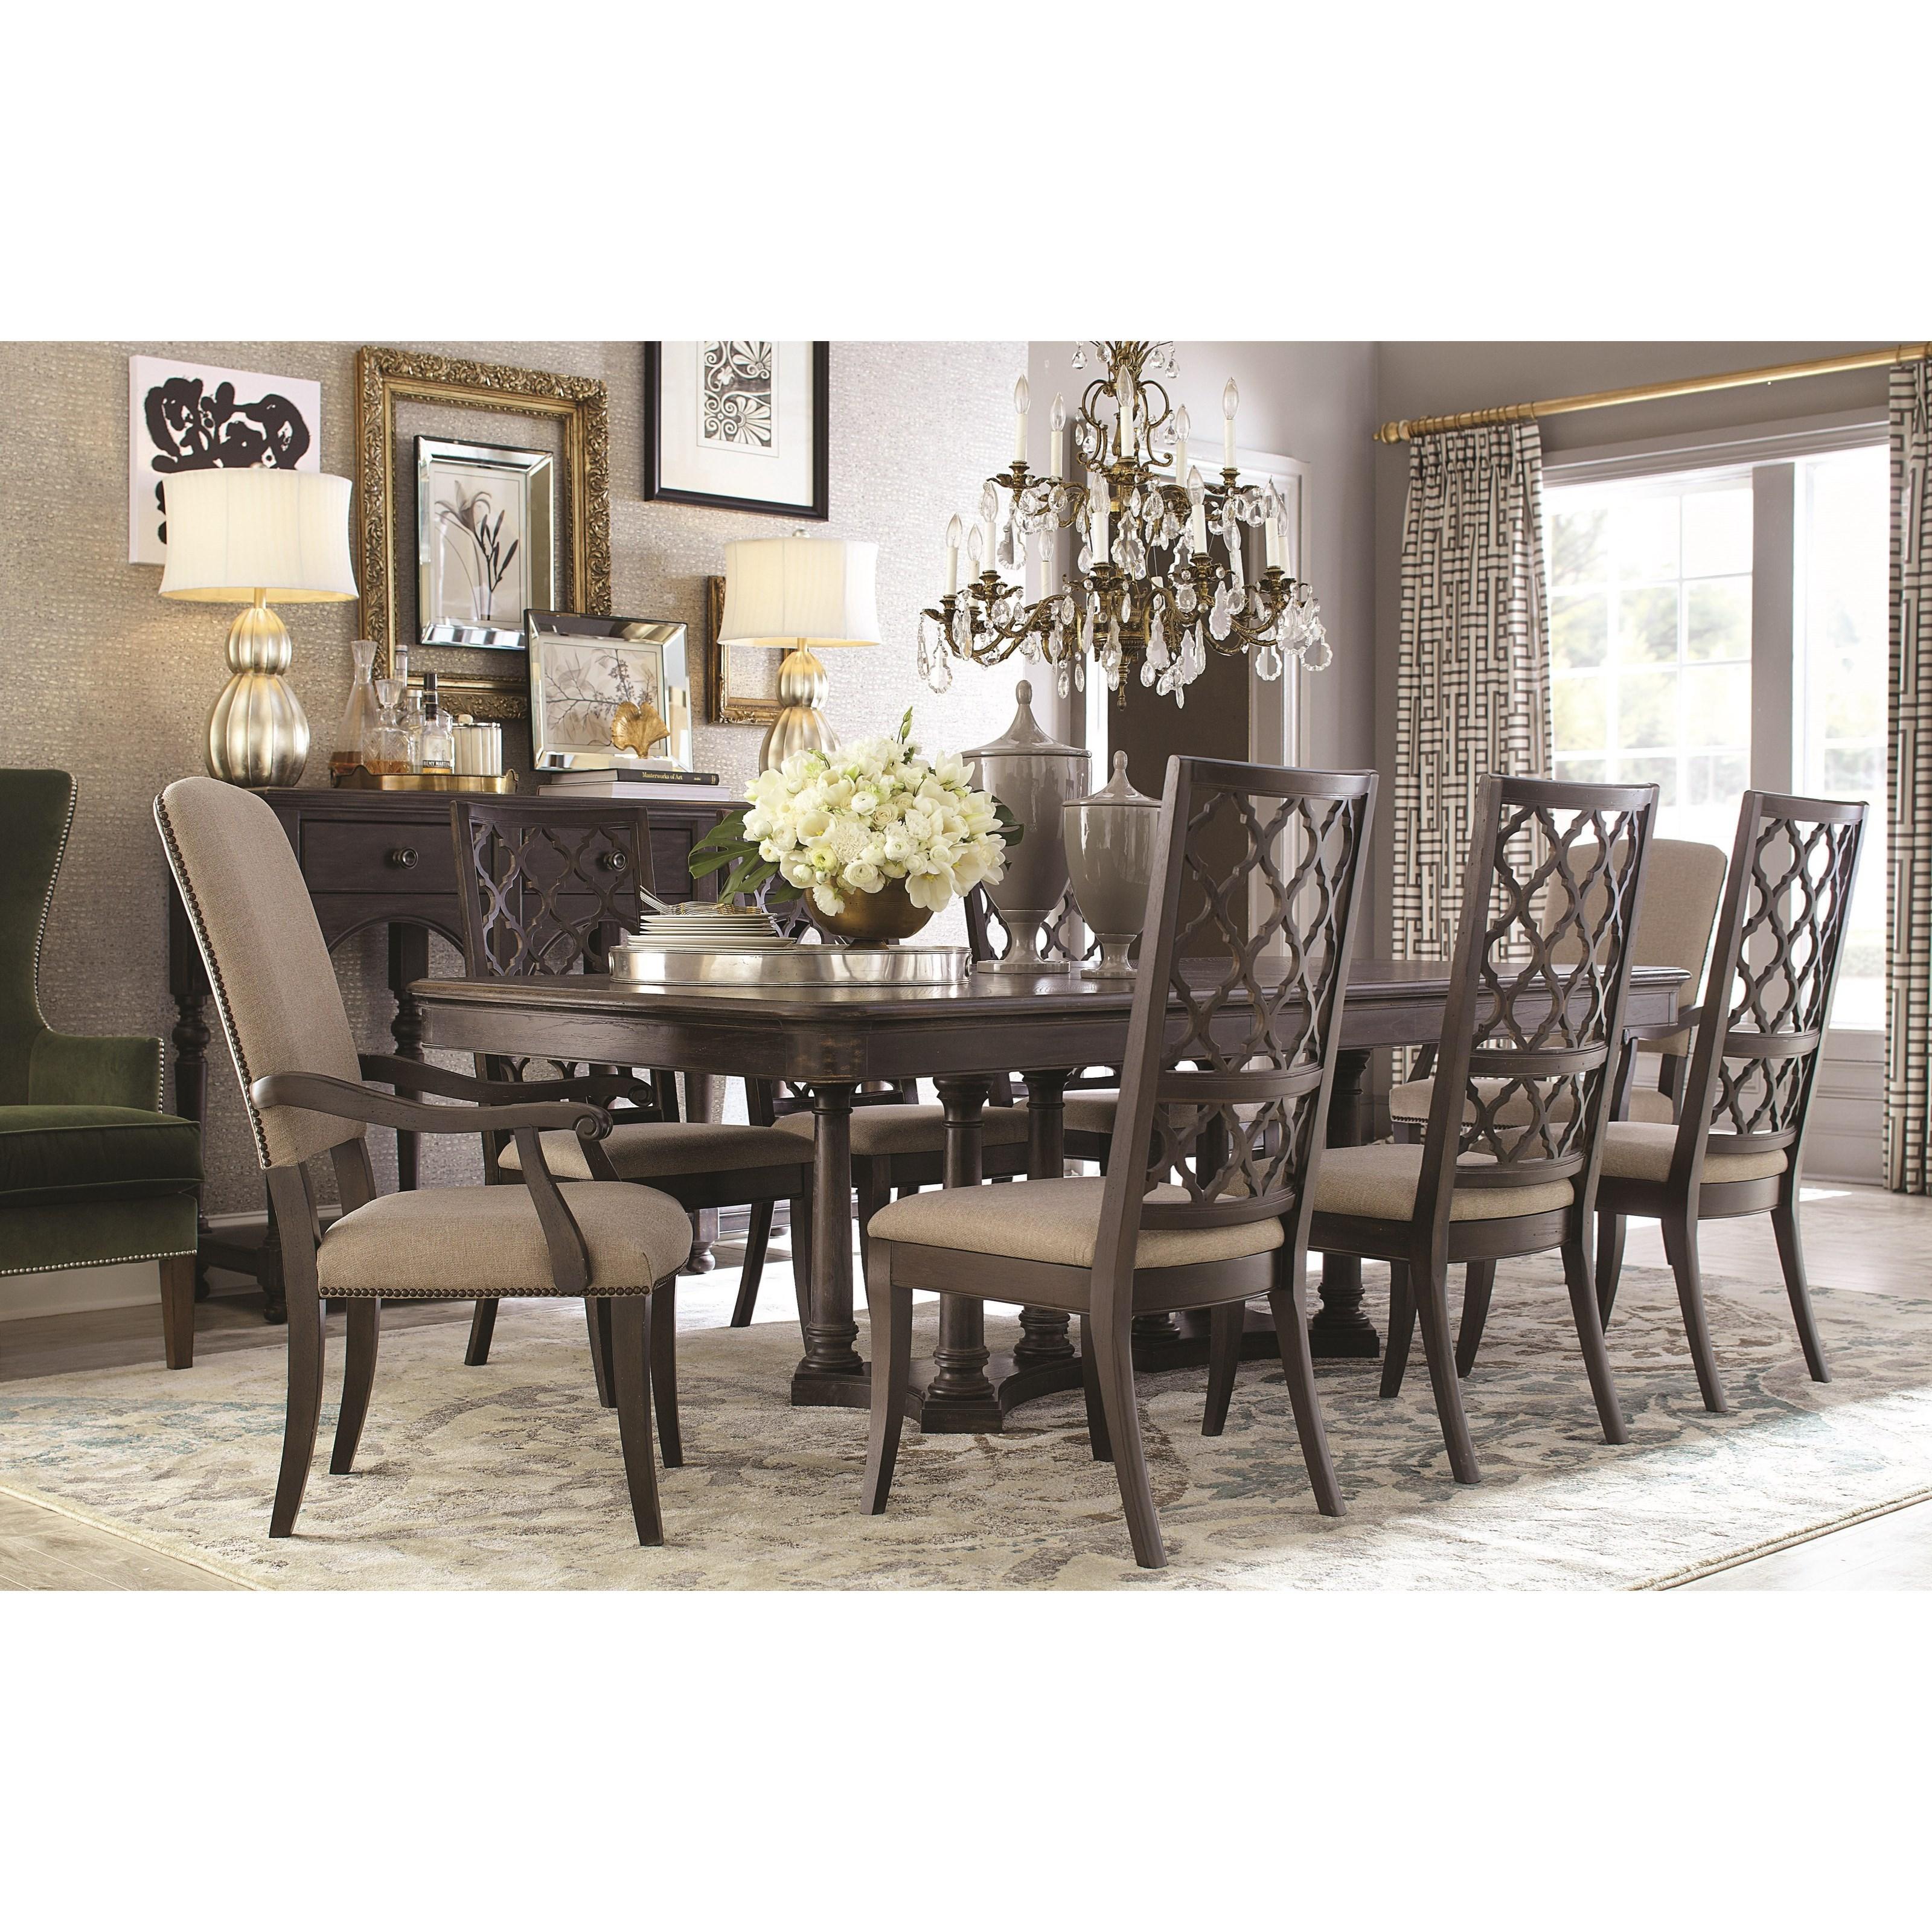 Bassett Emporium Rectangular Dining Table seats up to 10 Fashion Furnitur